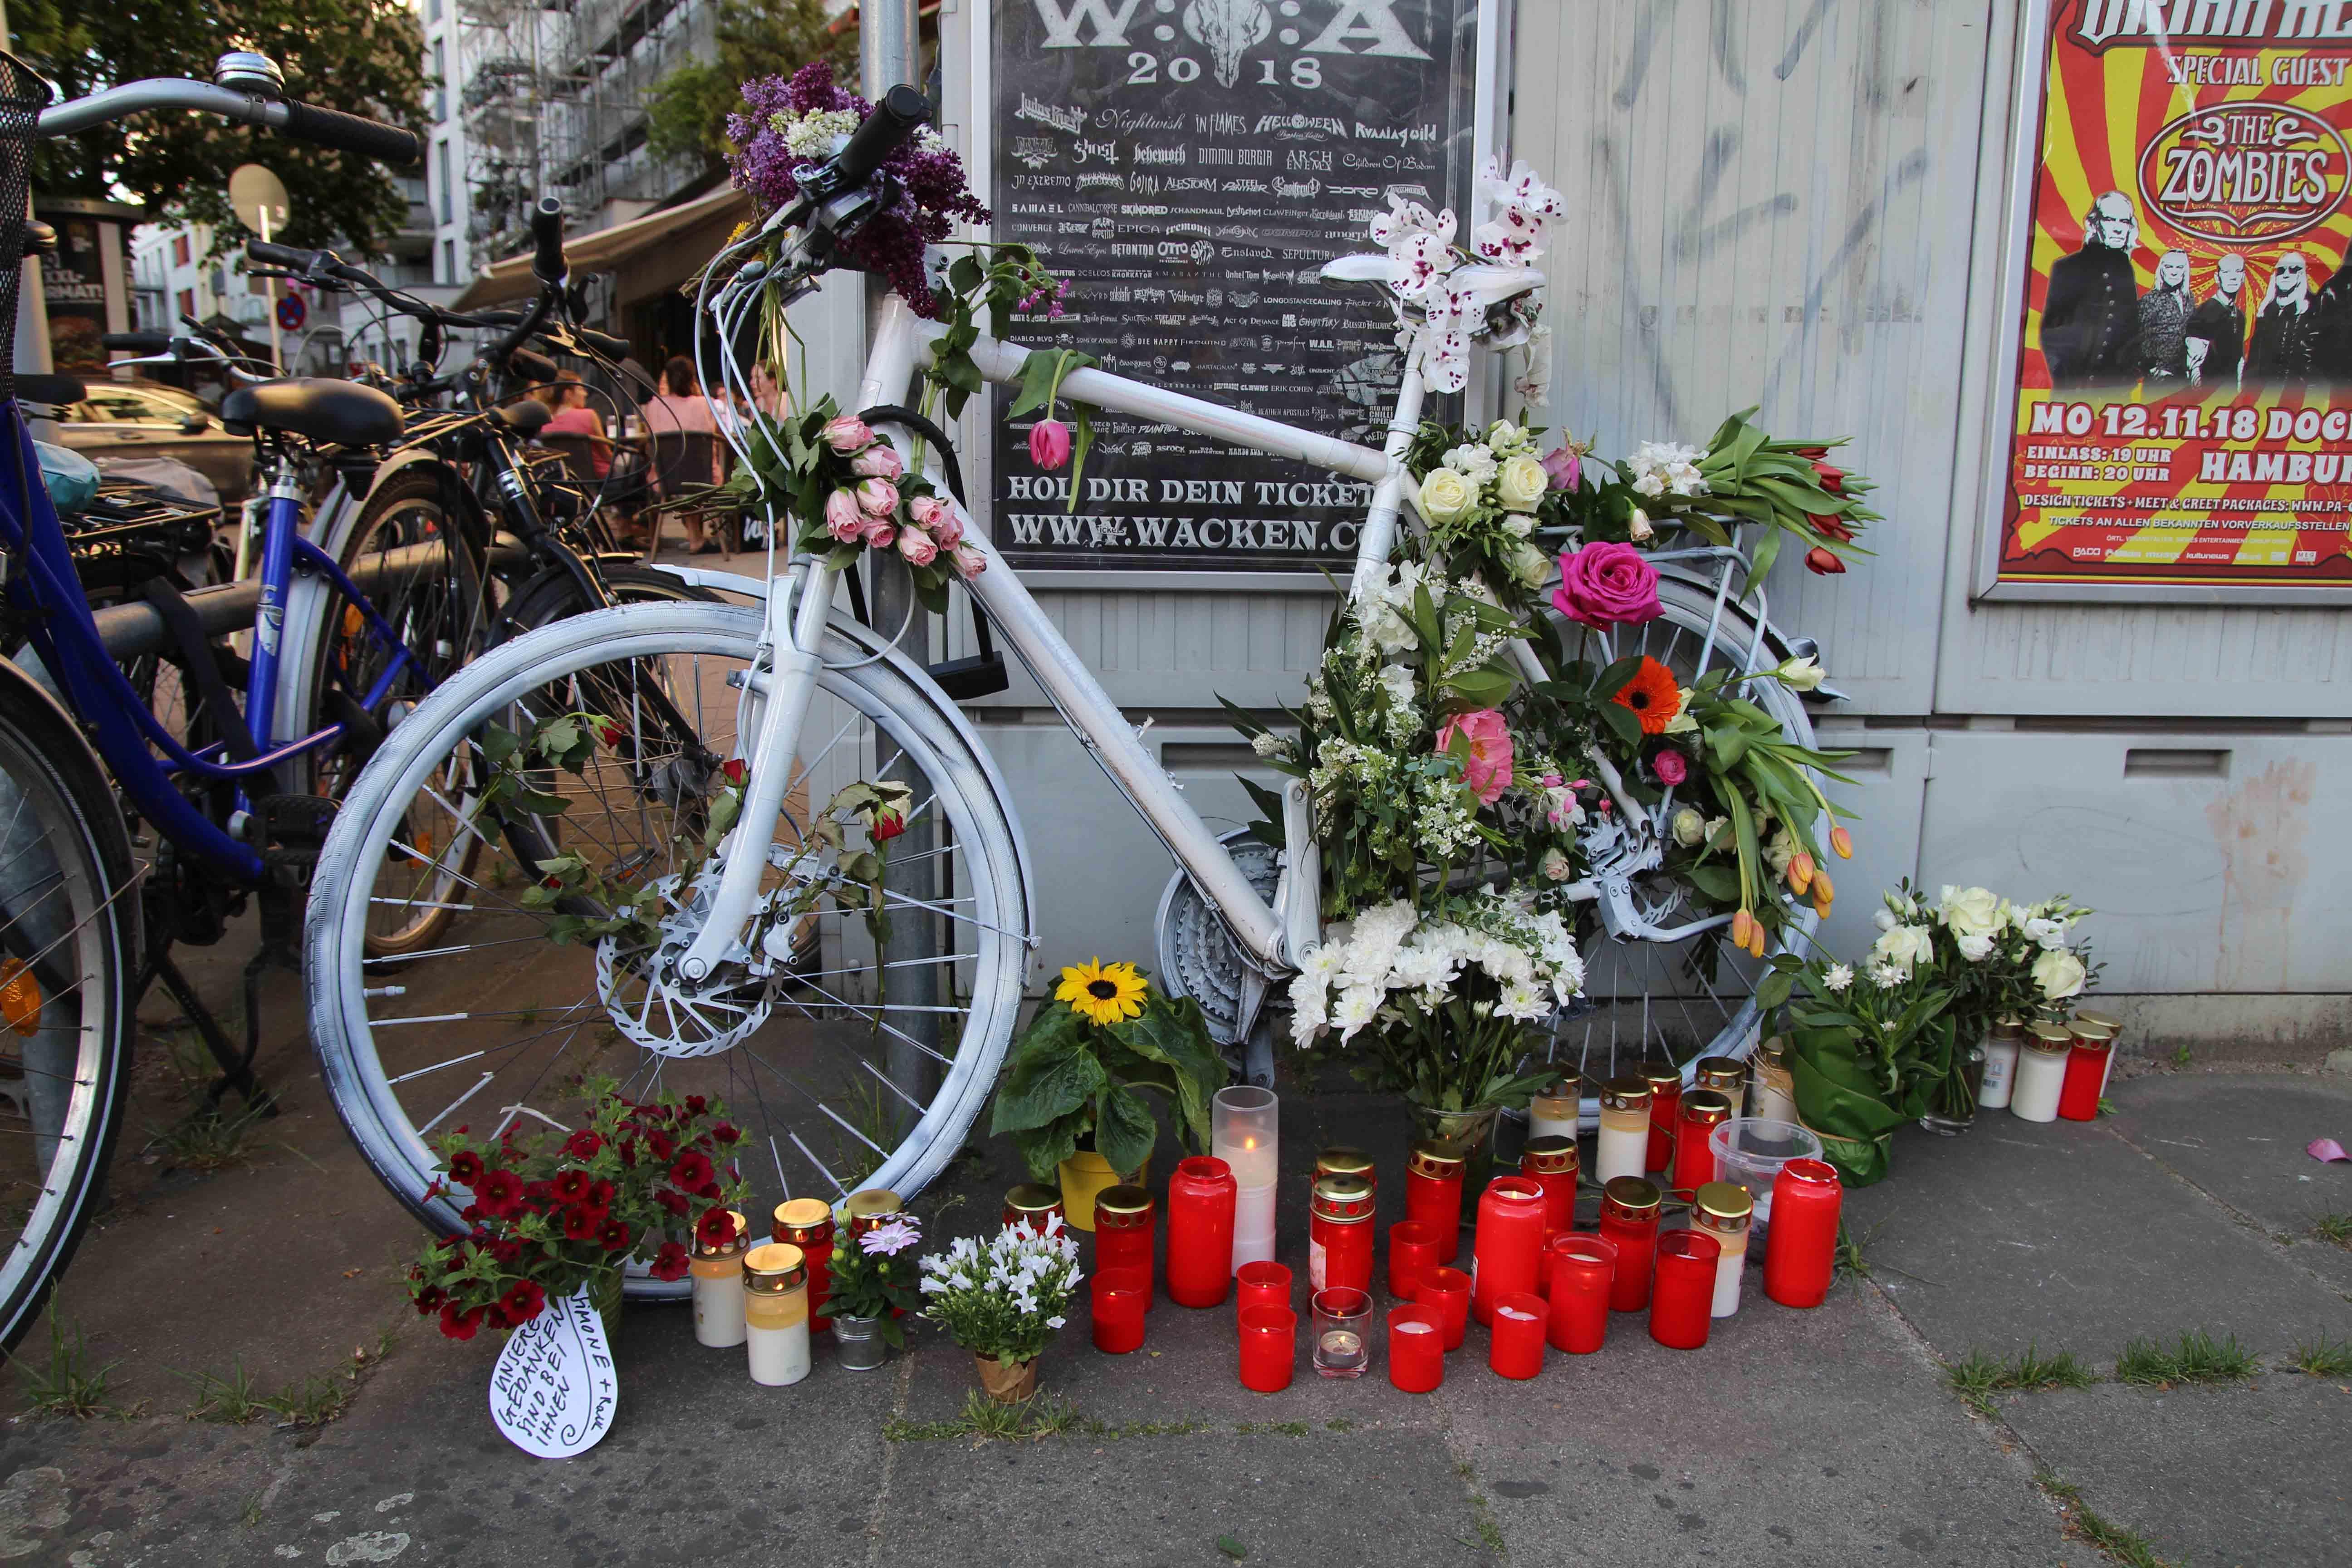 Frau stirbt bei Verkehrsunfall in Eimsbüttel   FINK.HAMBURG